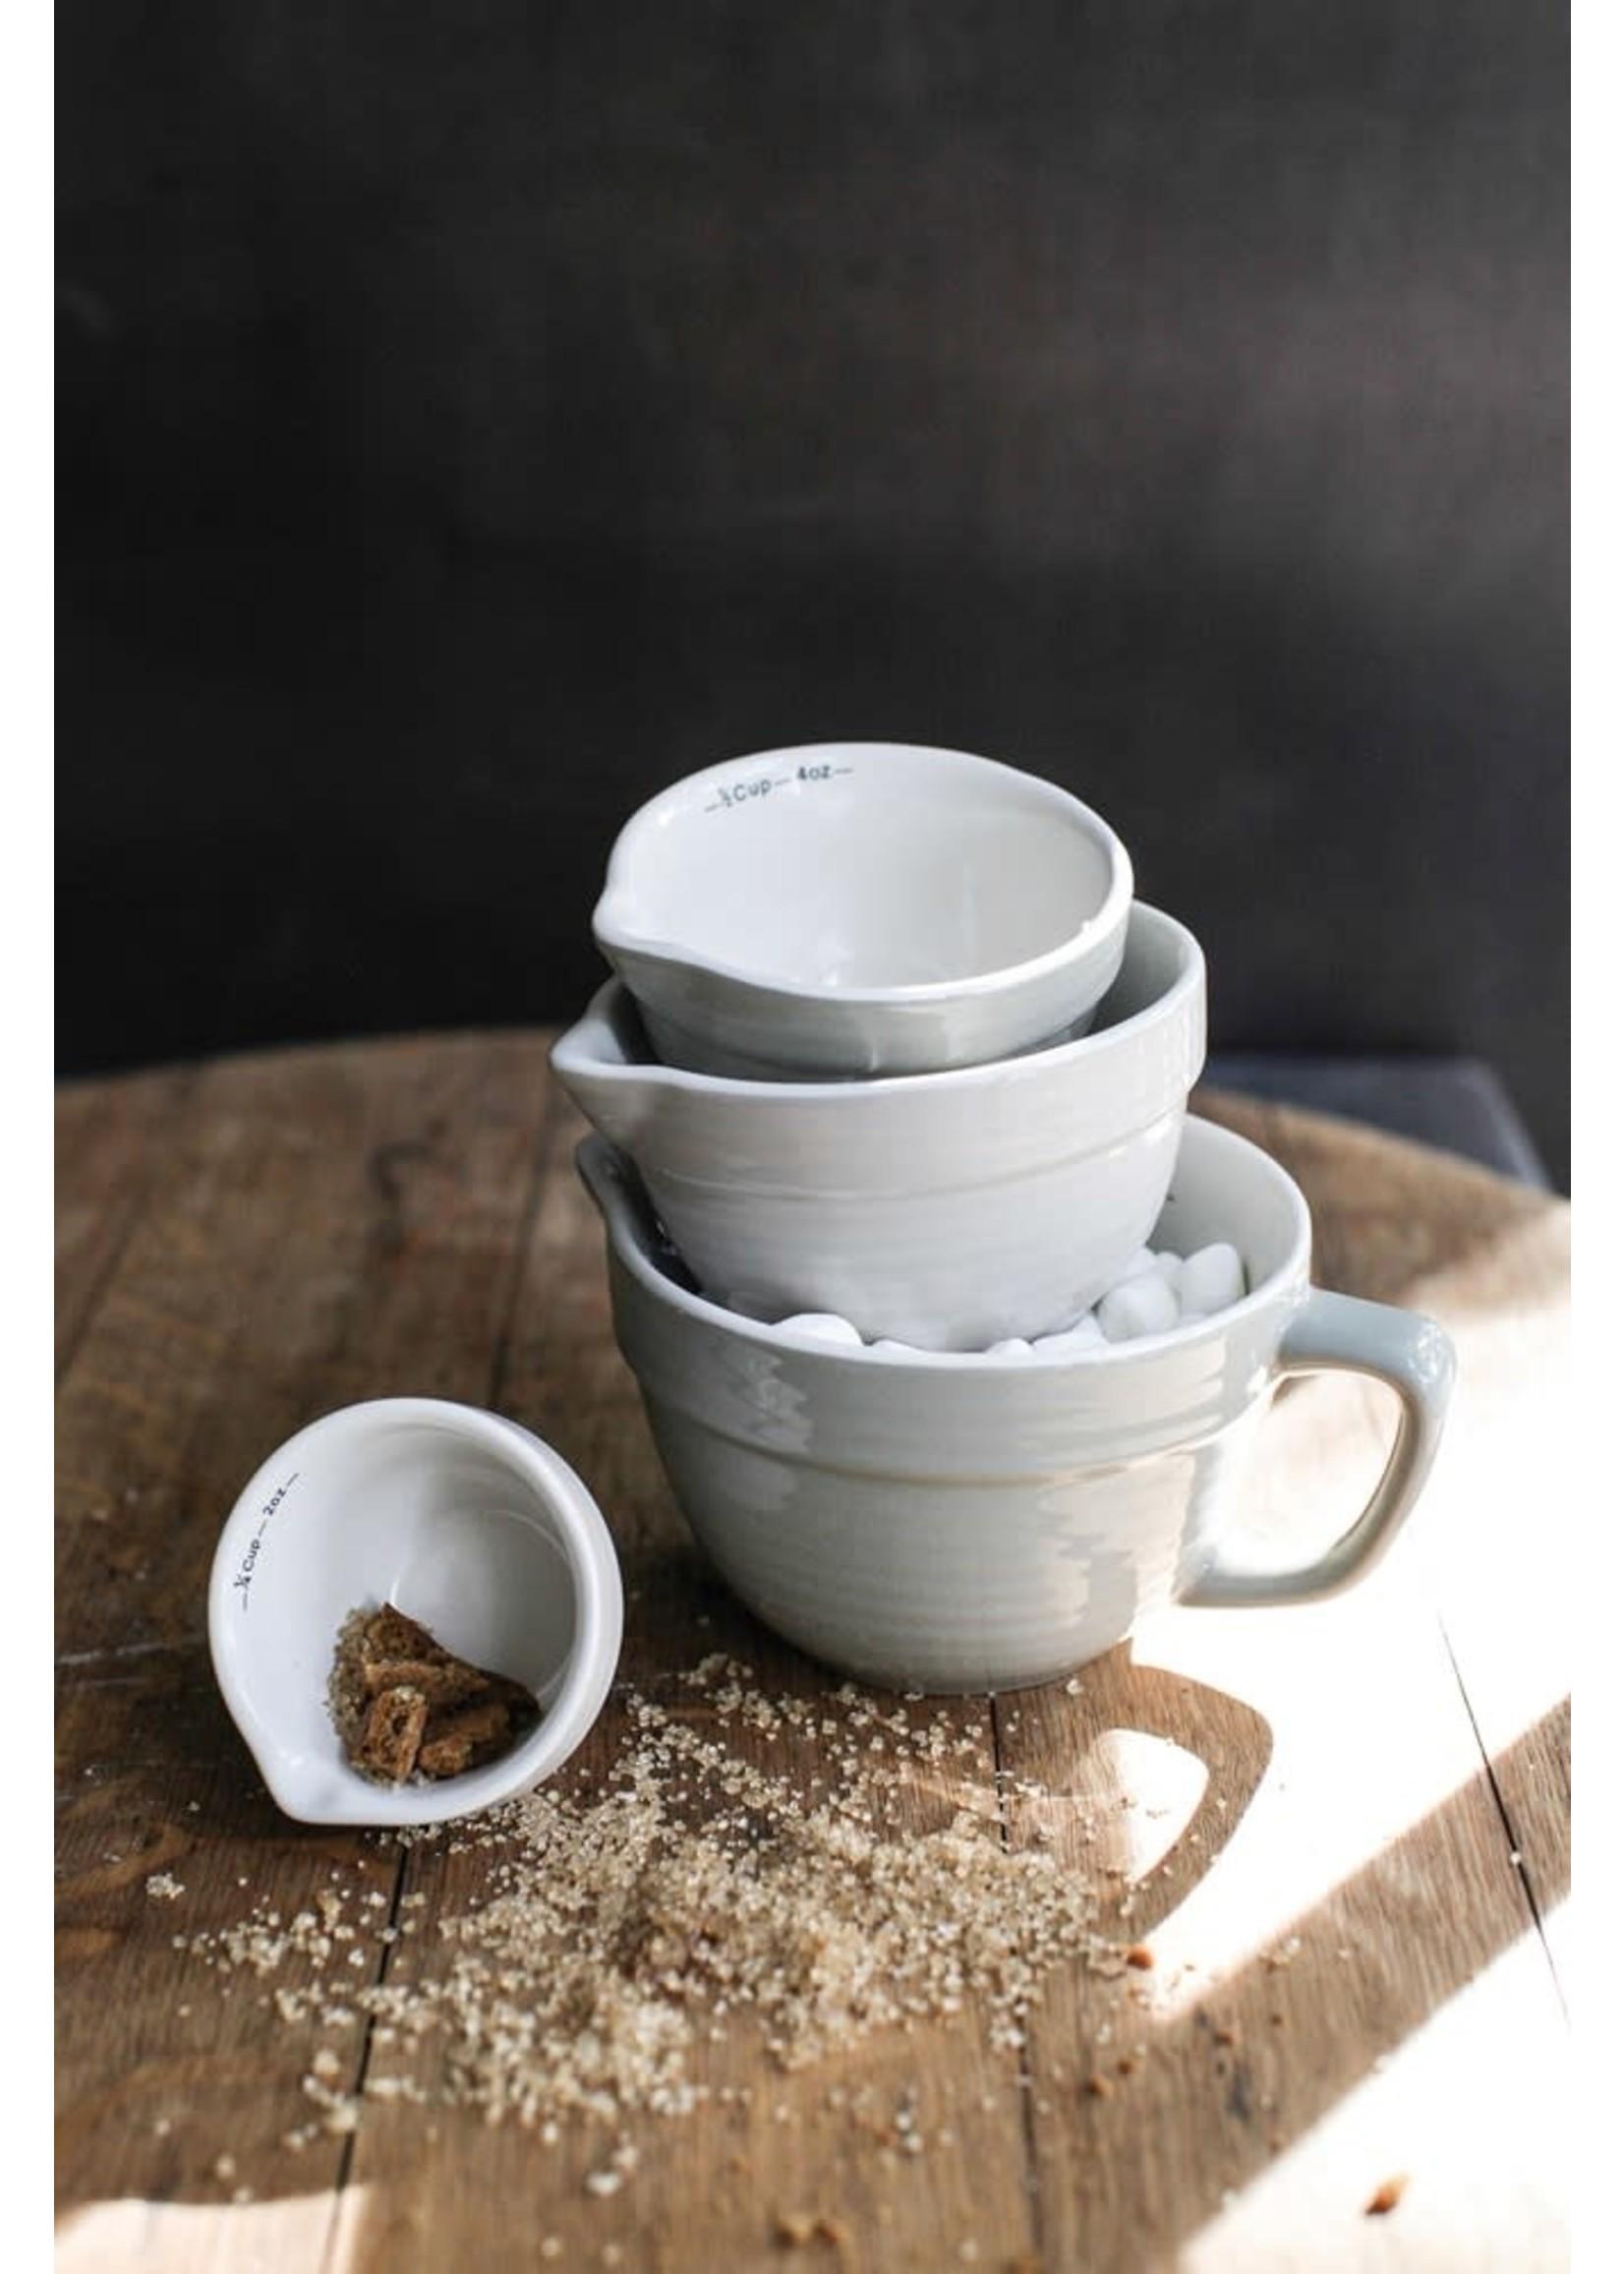 STONEWARE BATTER BOWL MEASURING CUPS, GRAY